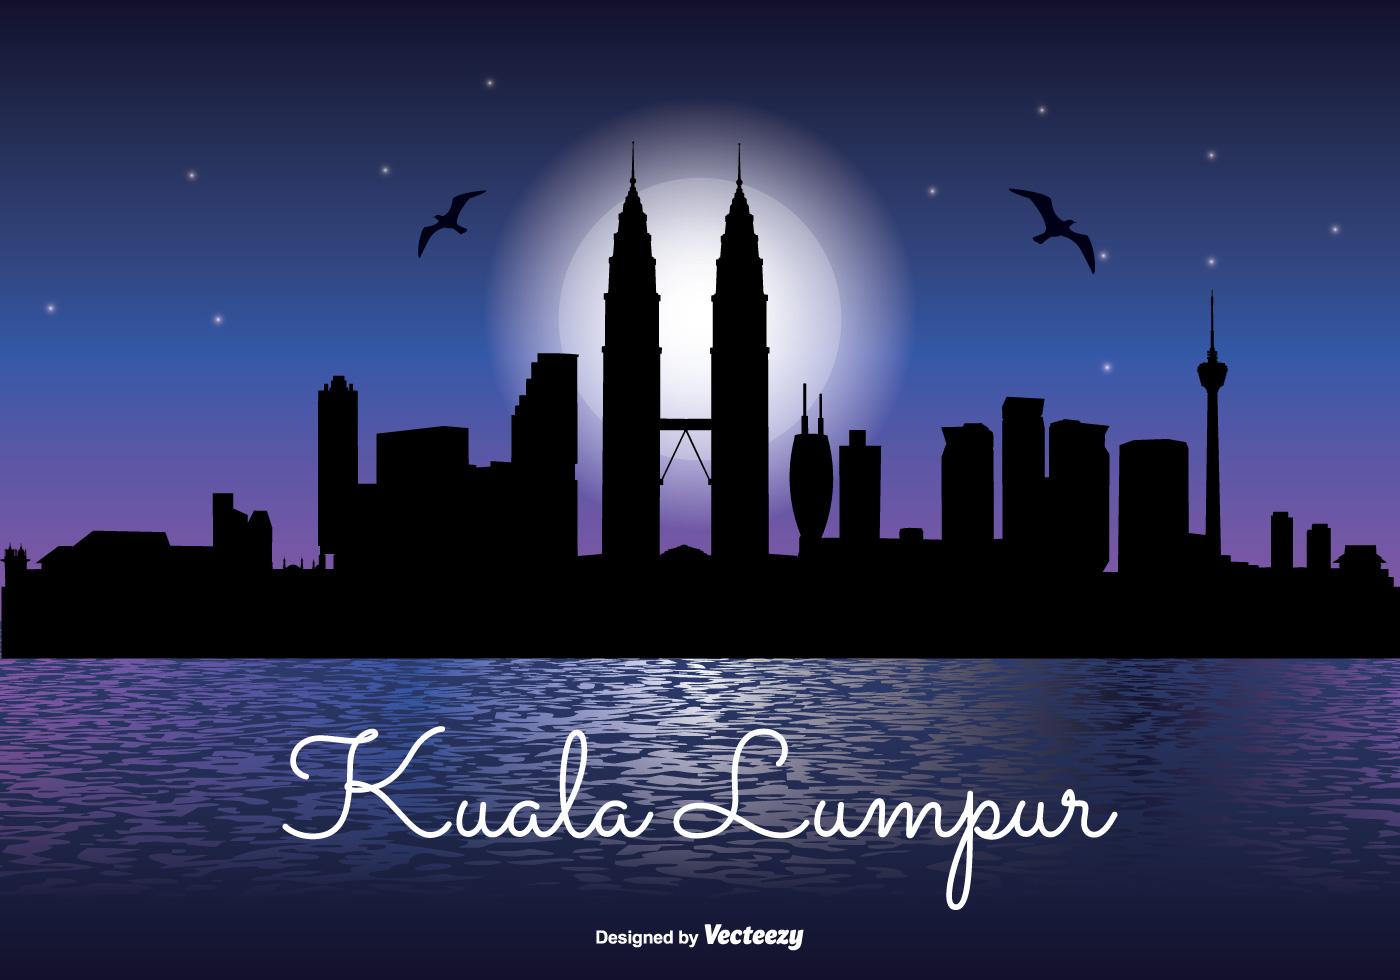 Kuala Lumpur Night Skyline Illustration Download Free Vector Art Stock Graphics Amp Images